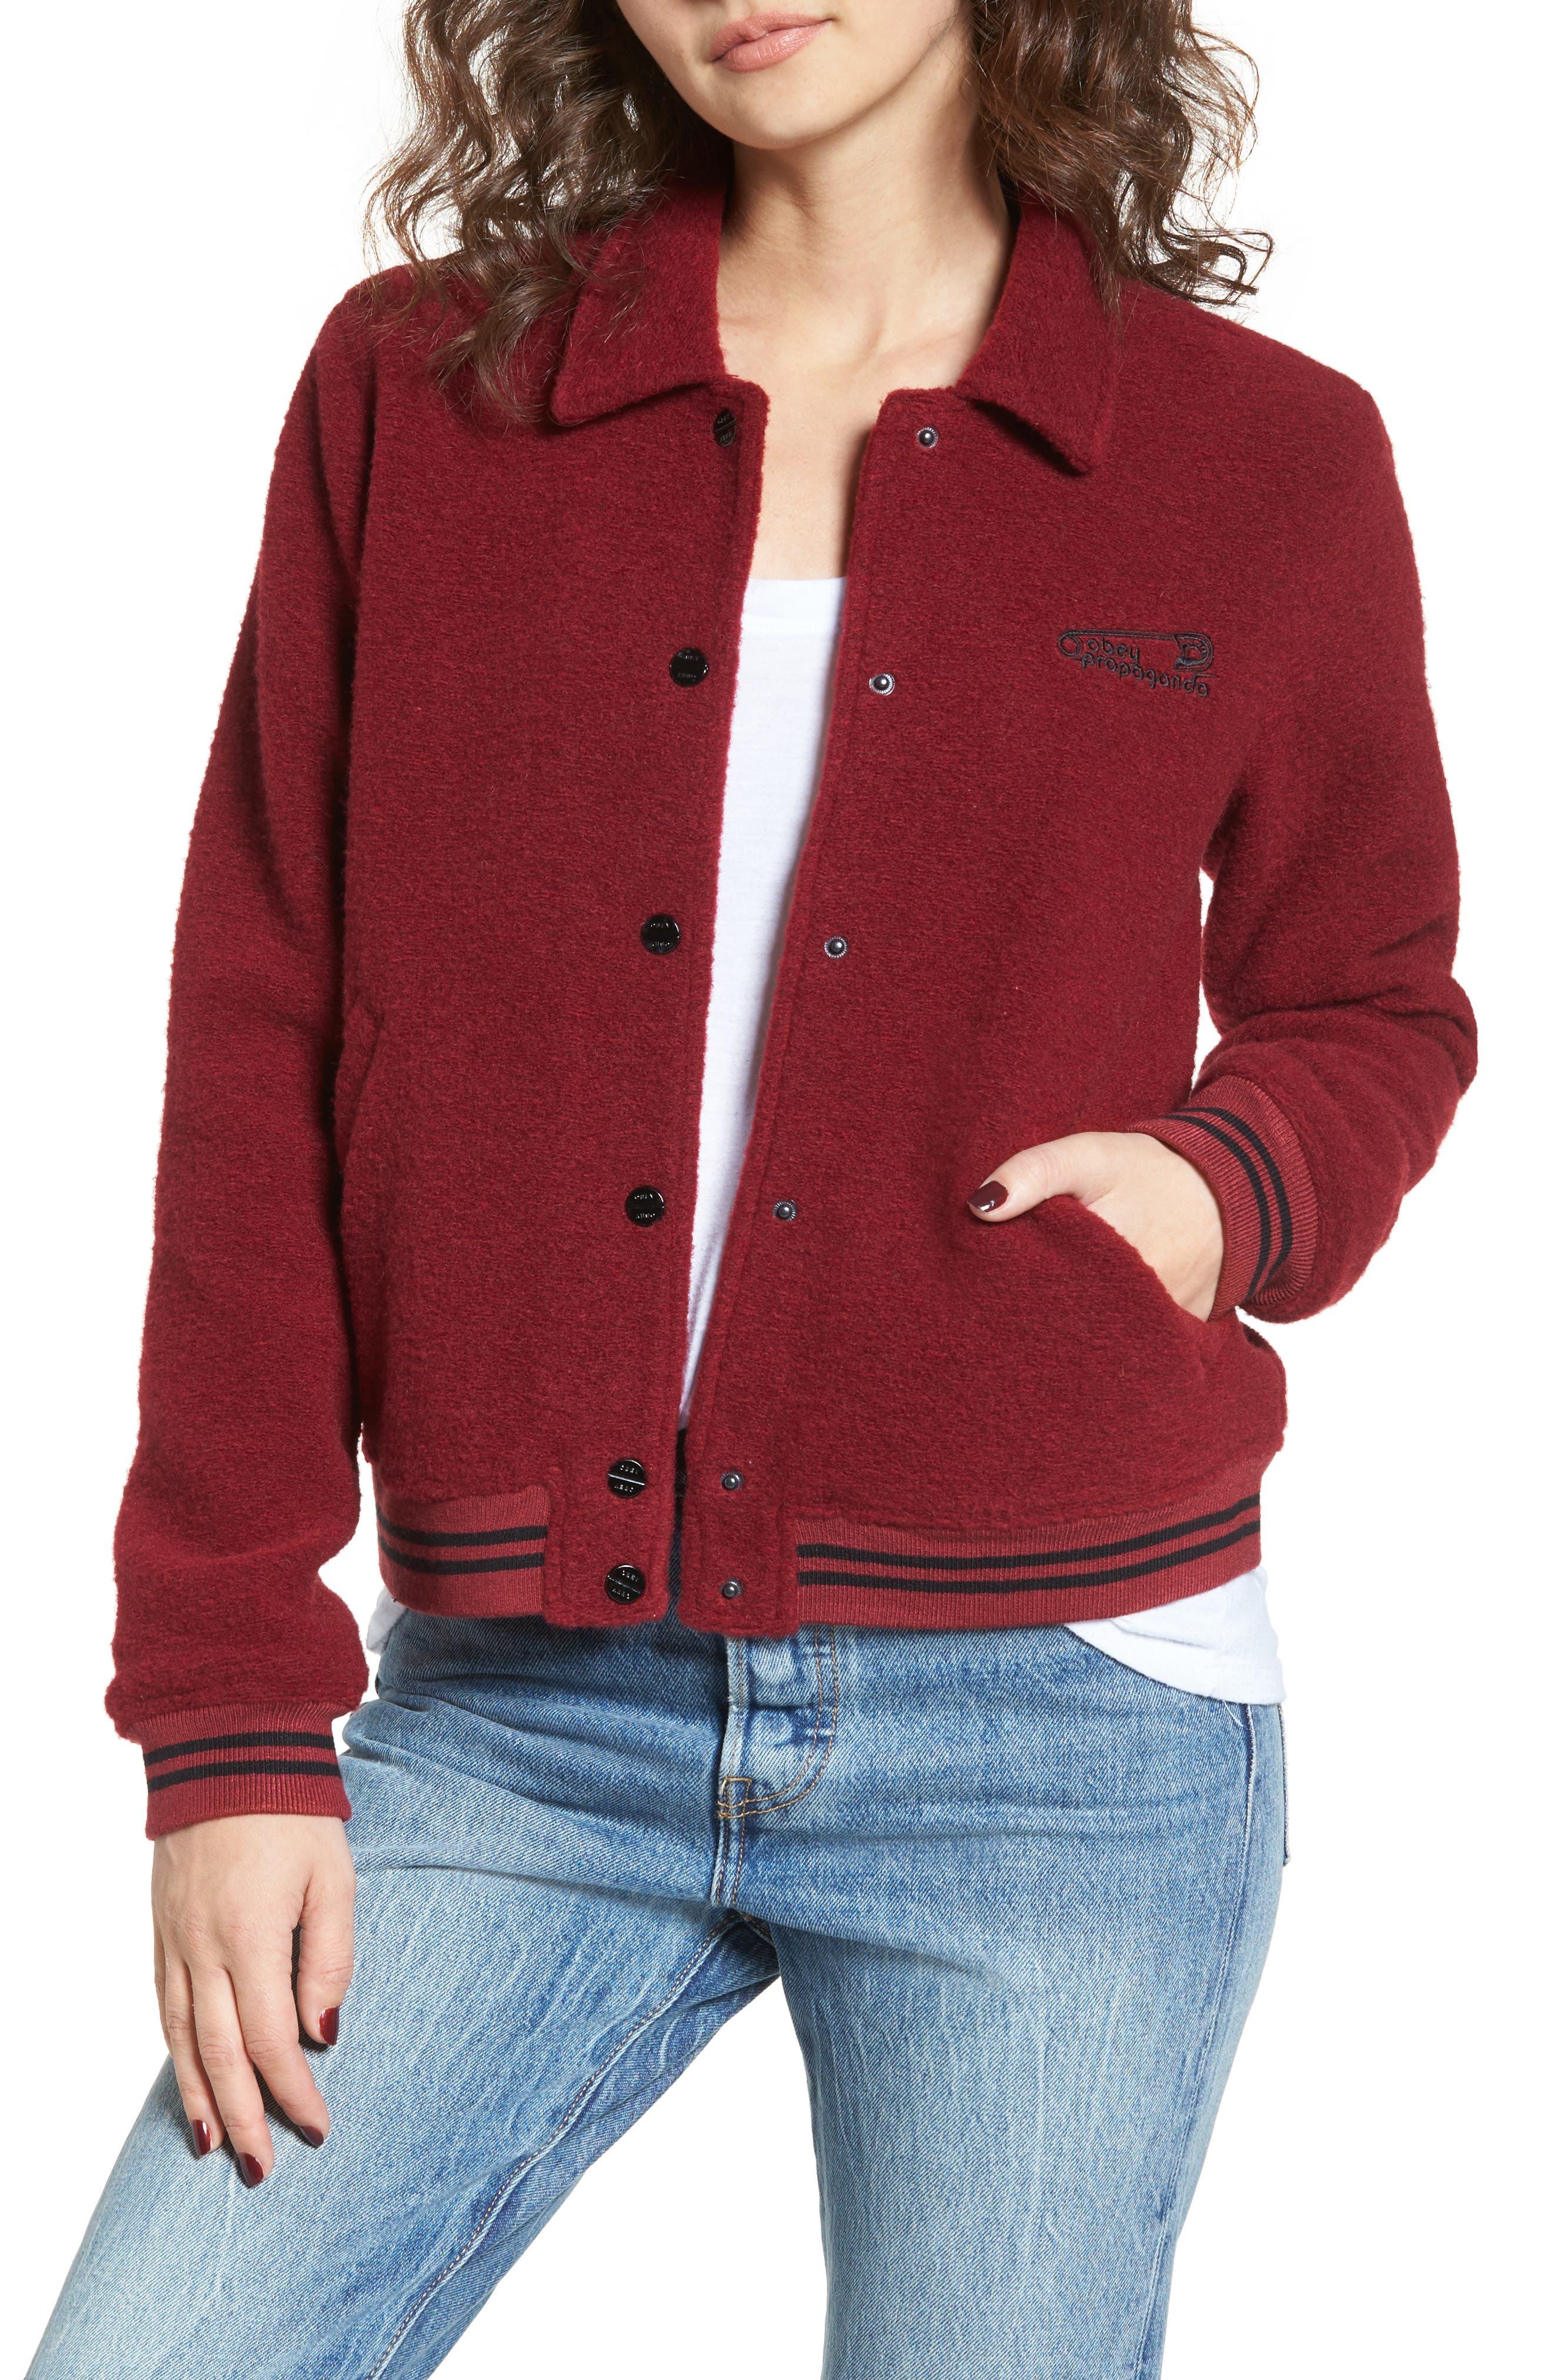 Cambridge Jacket,                             Main thumbnail 1, color,                             930